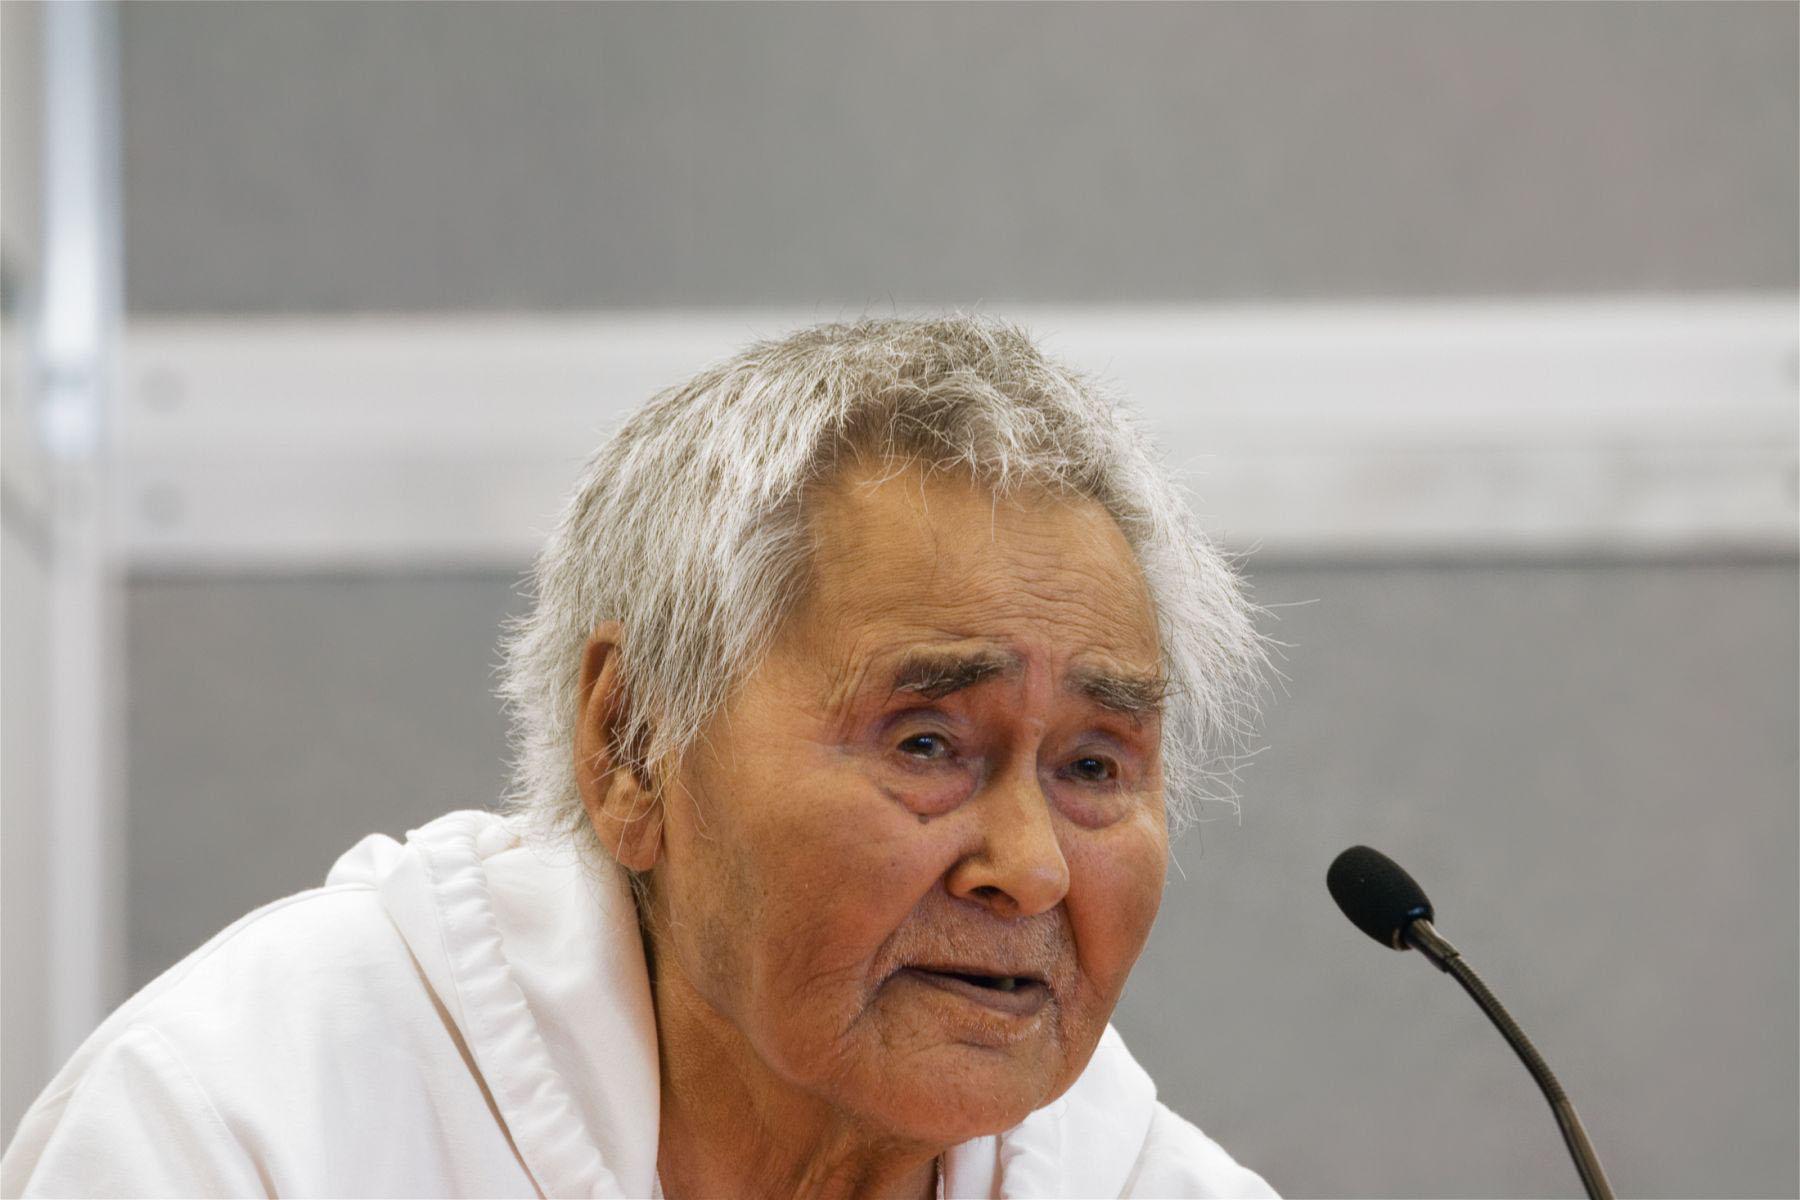 Naalak Nappaaluk, Inur Elder, Kangirsujuaq, Nunavik, Canada, 2005